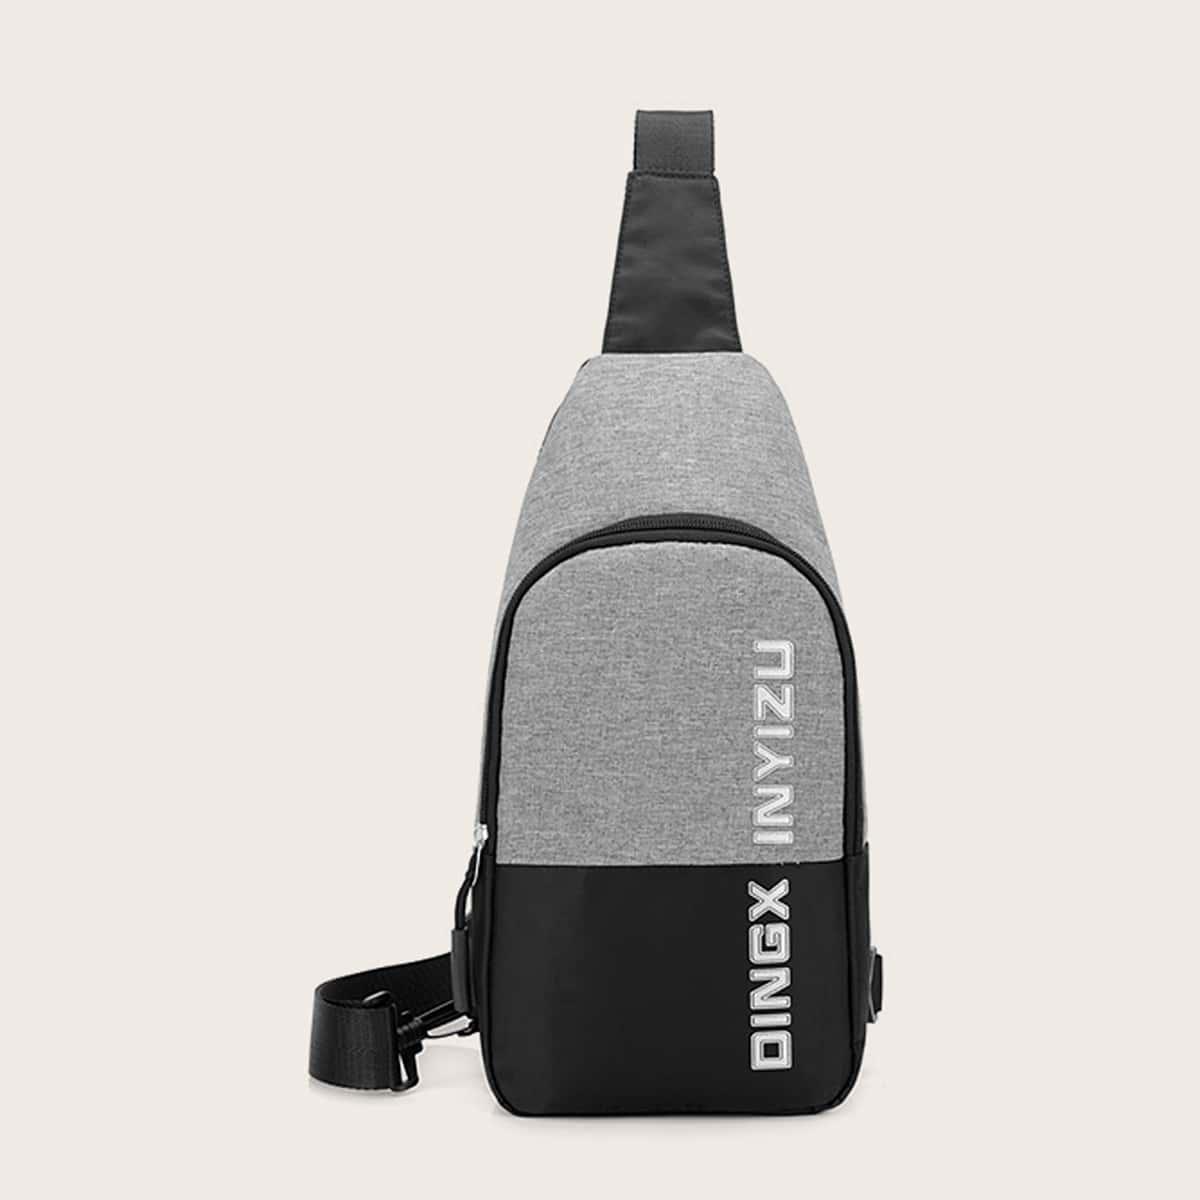 Mannen letter grafische tweekleurige sling bag